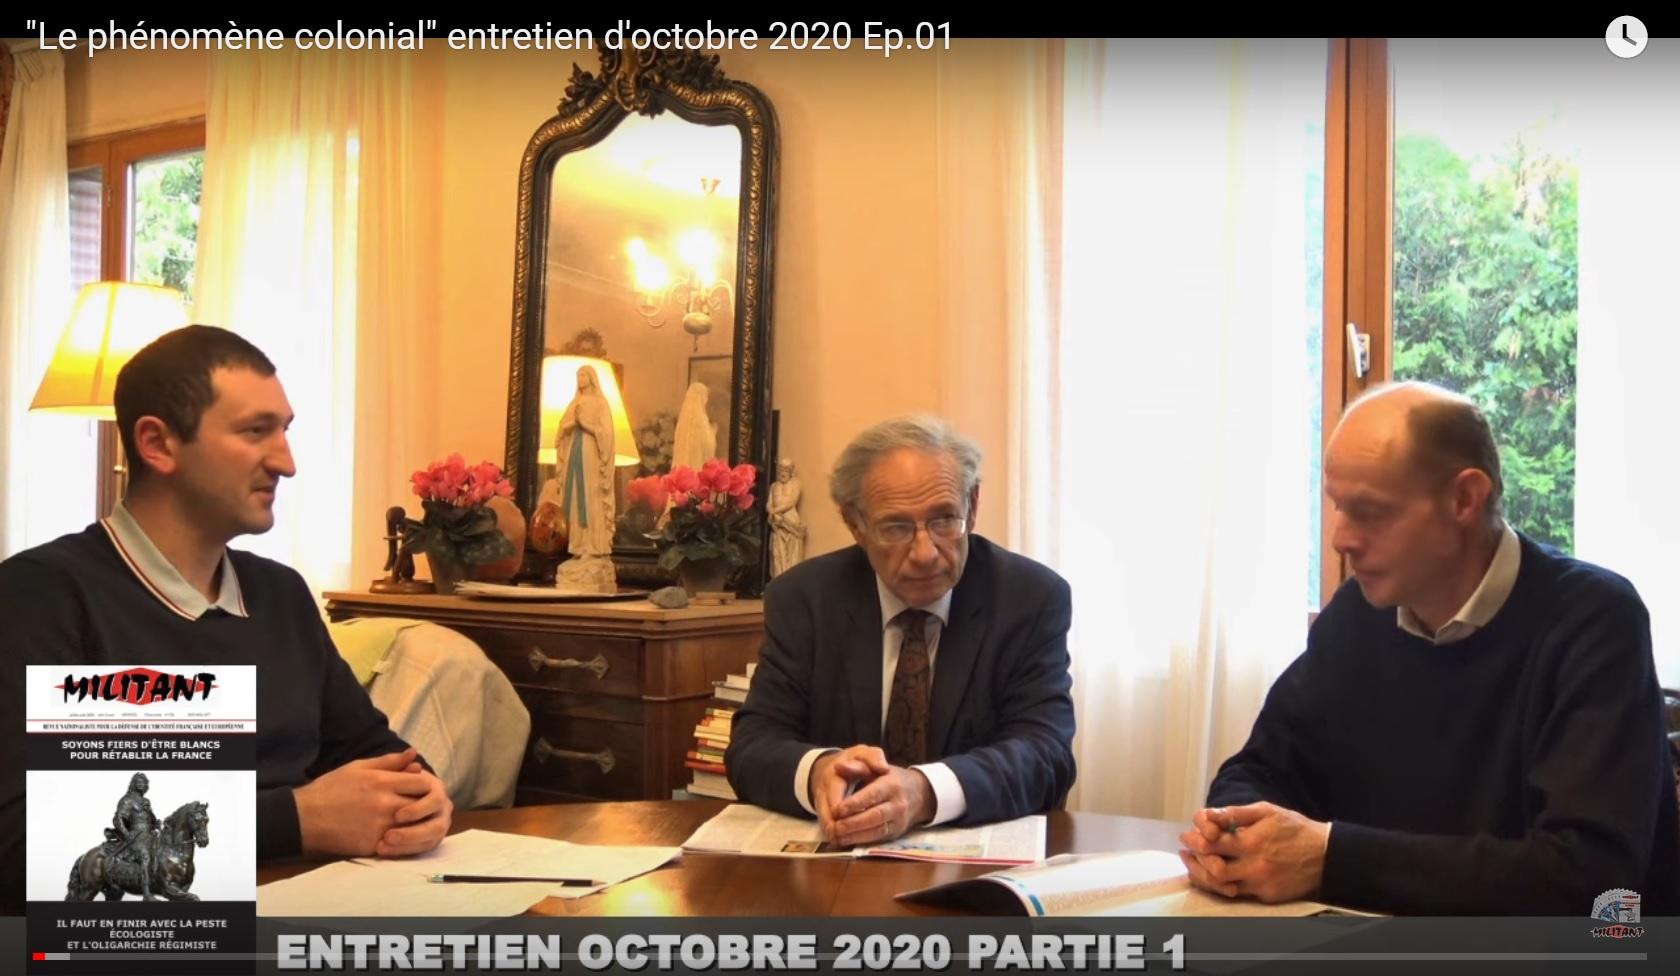 « Le phénomène colonial », entretien d'octobre 2020 (André Gandillon)